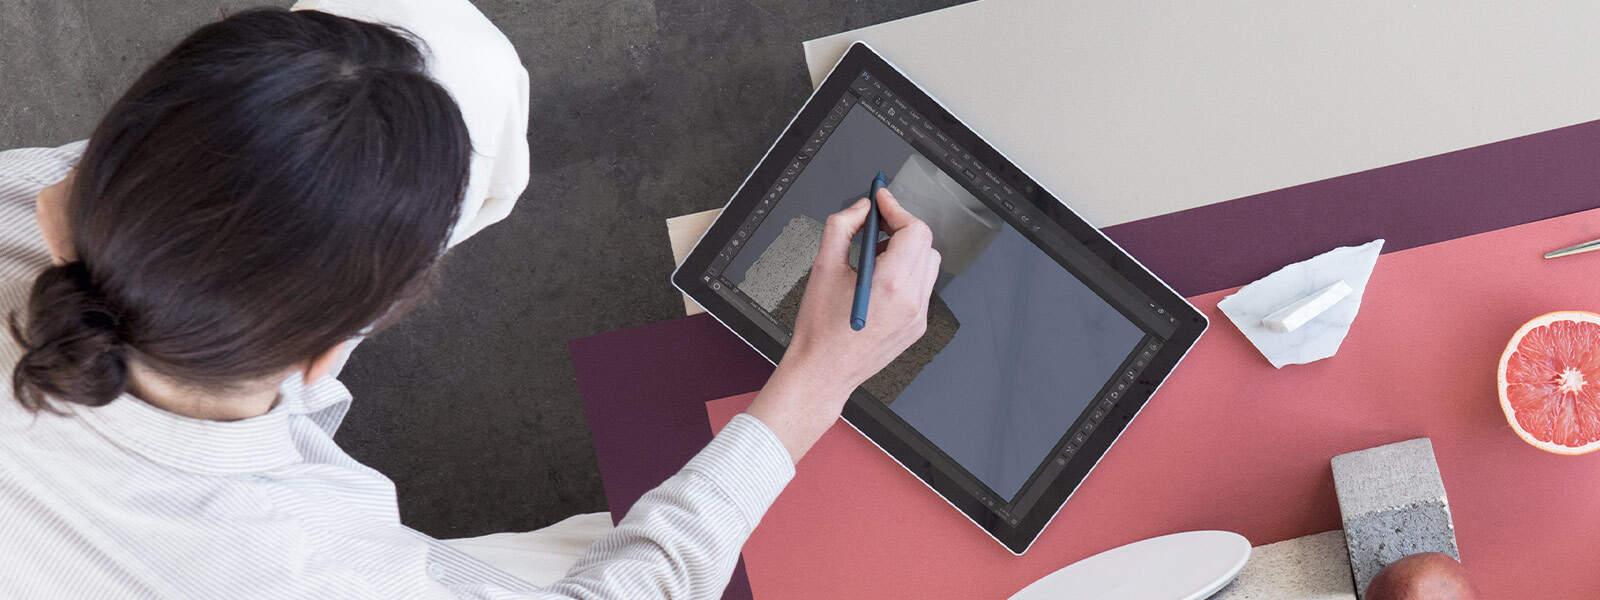 Microsoft, Surface, Pen, Windows 10